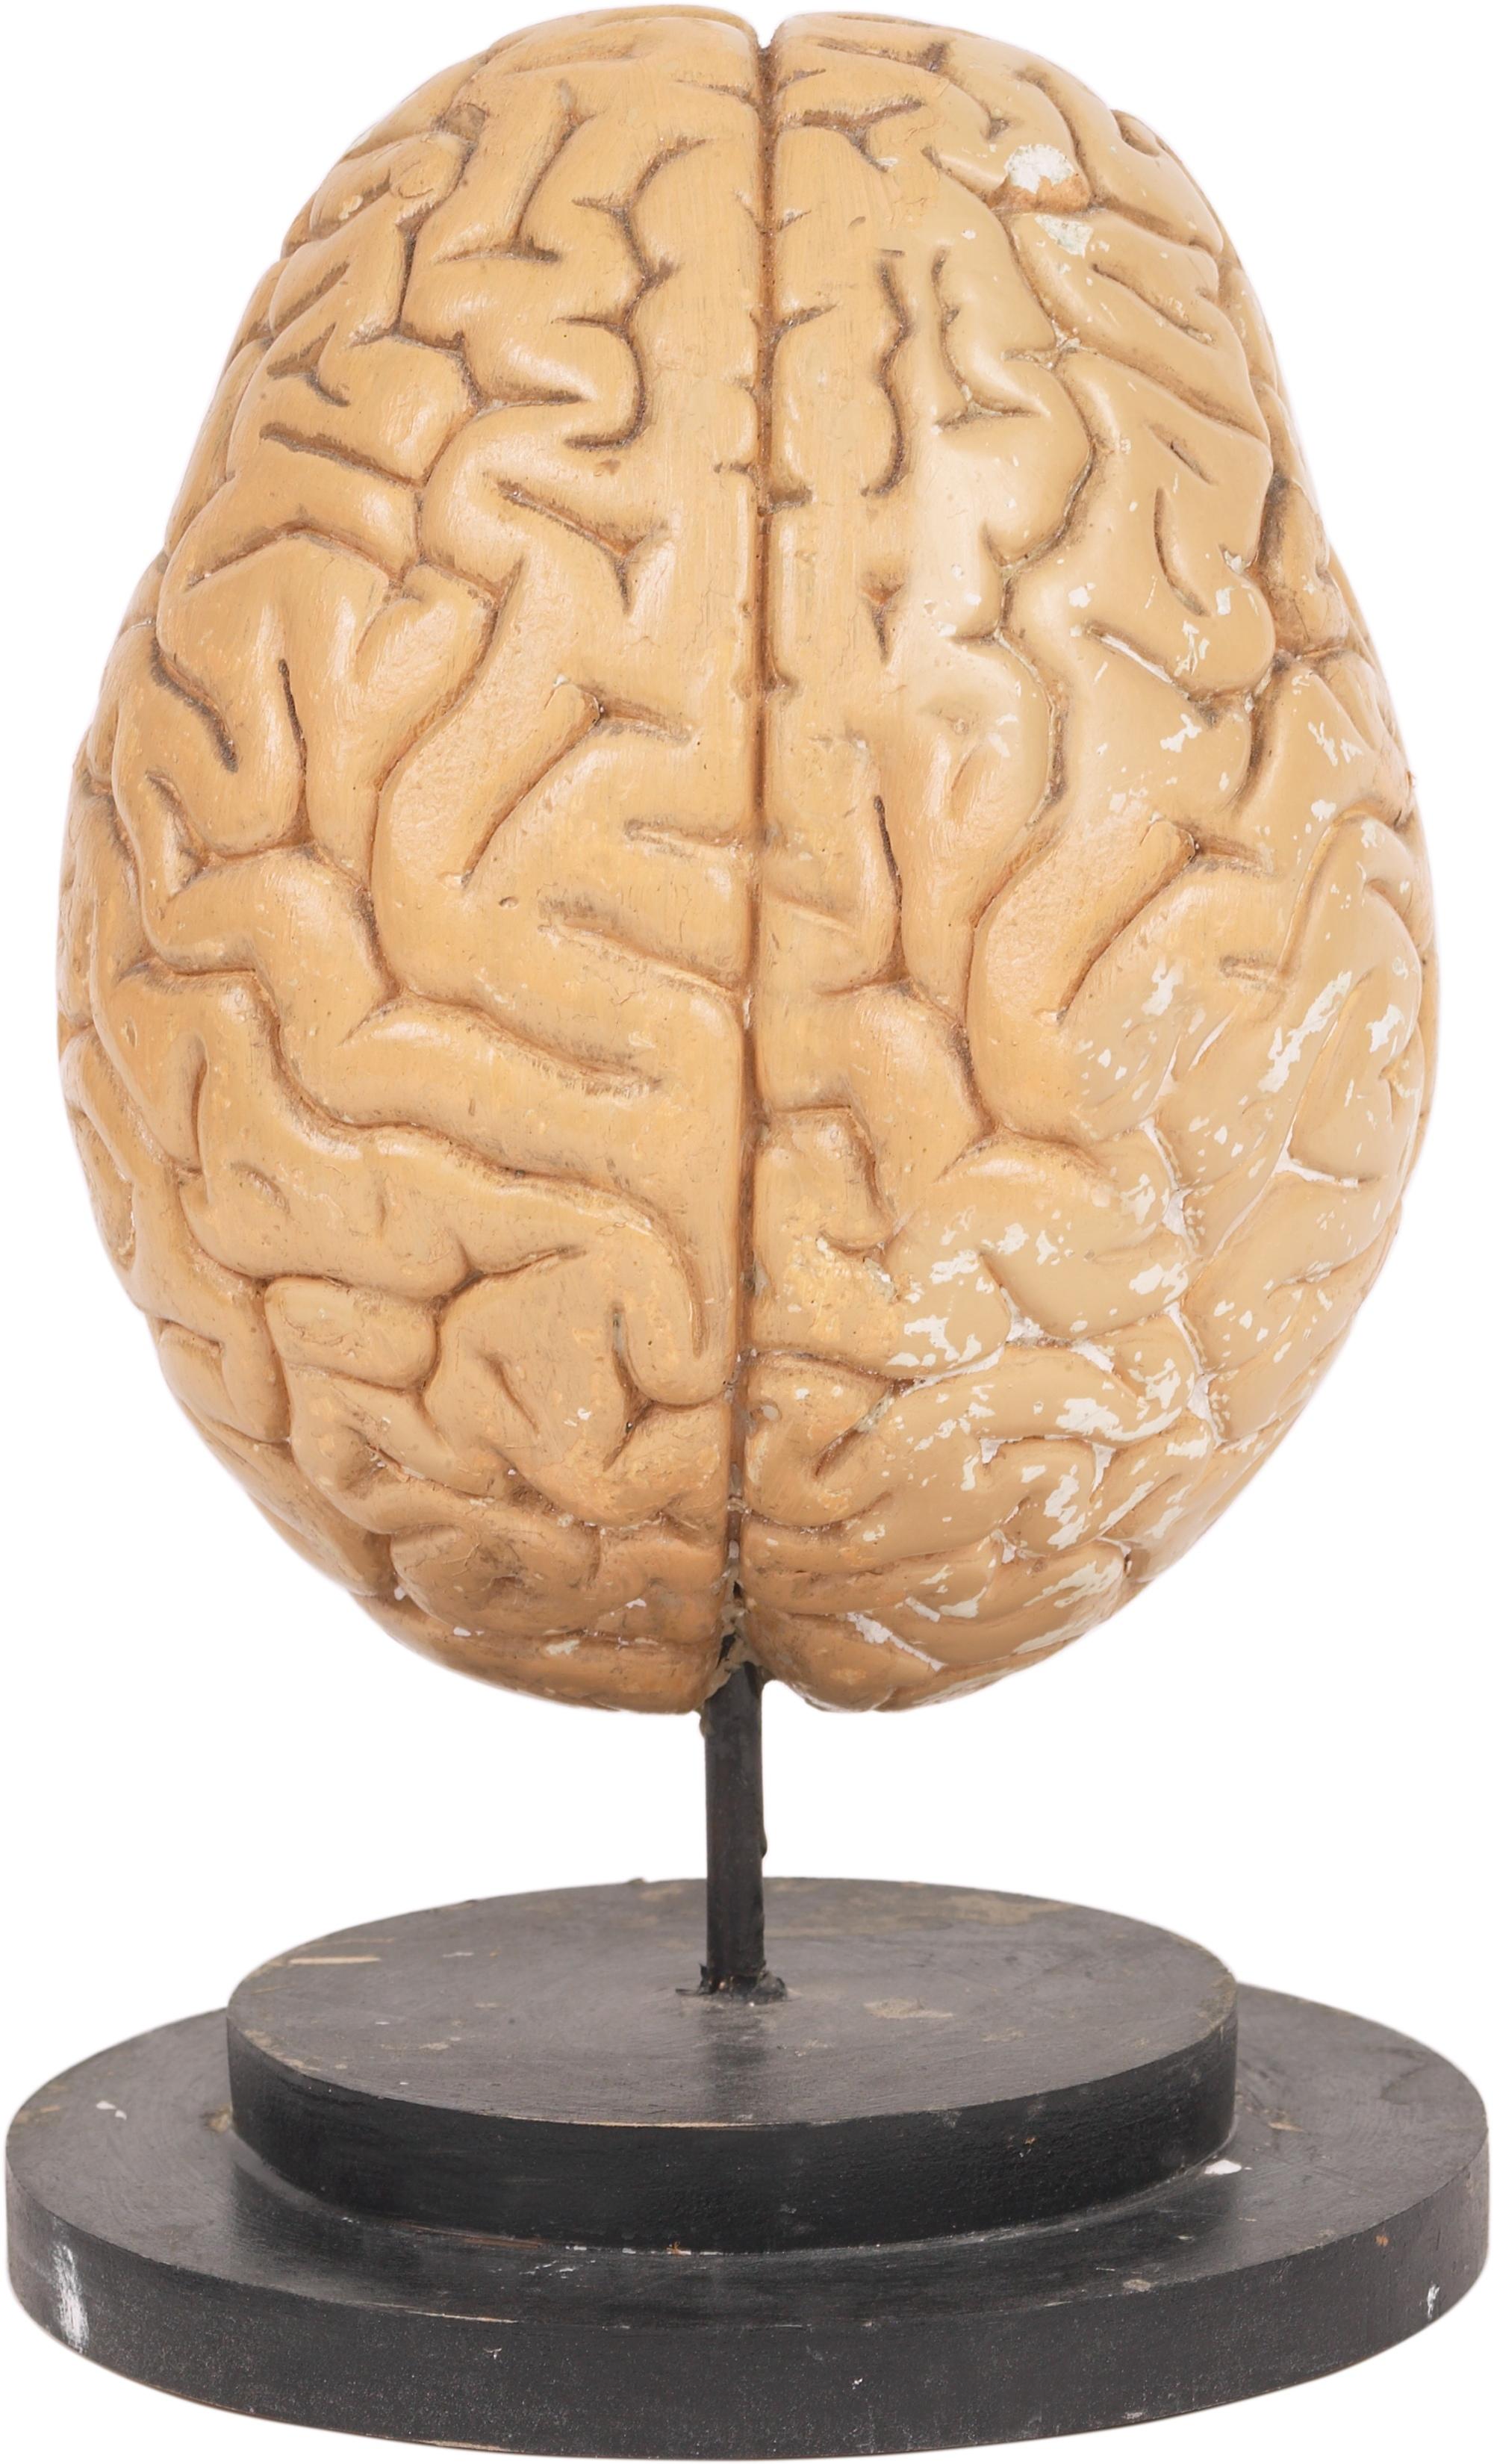 The ketogenic diet may alter neurotransmitter balance.